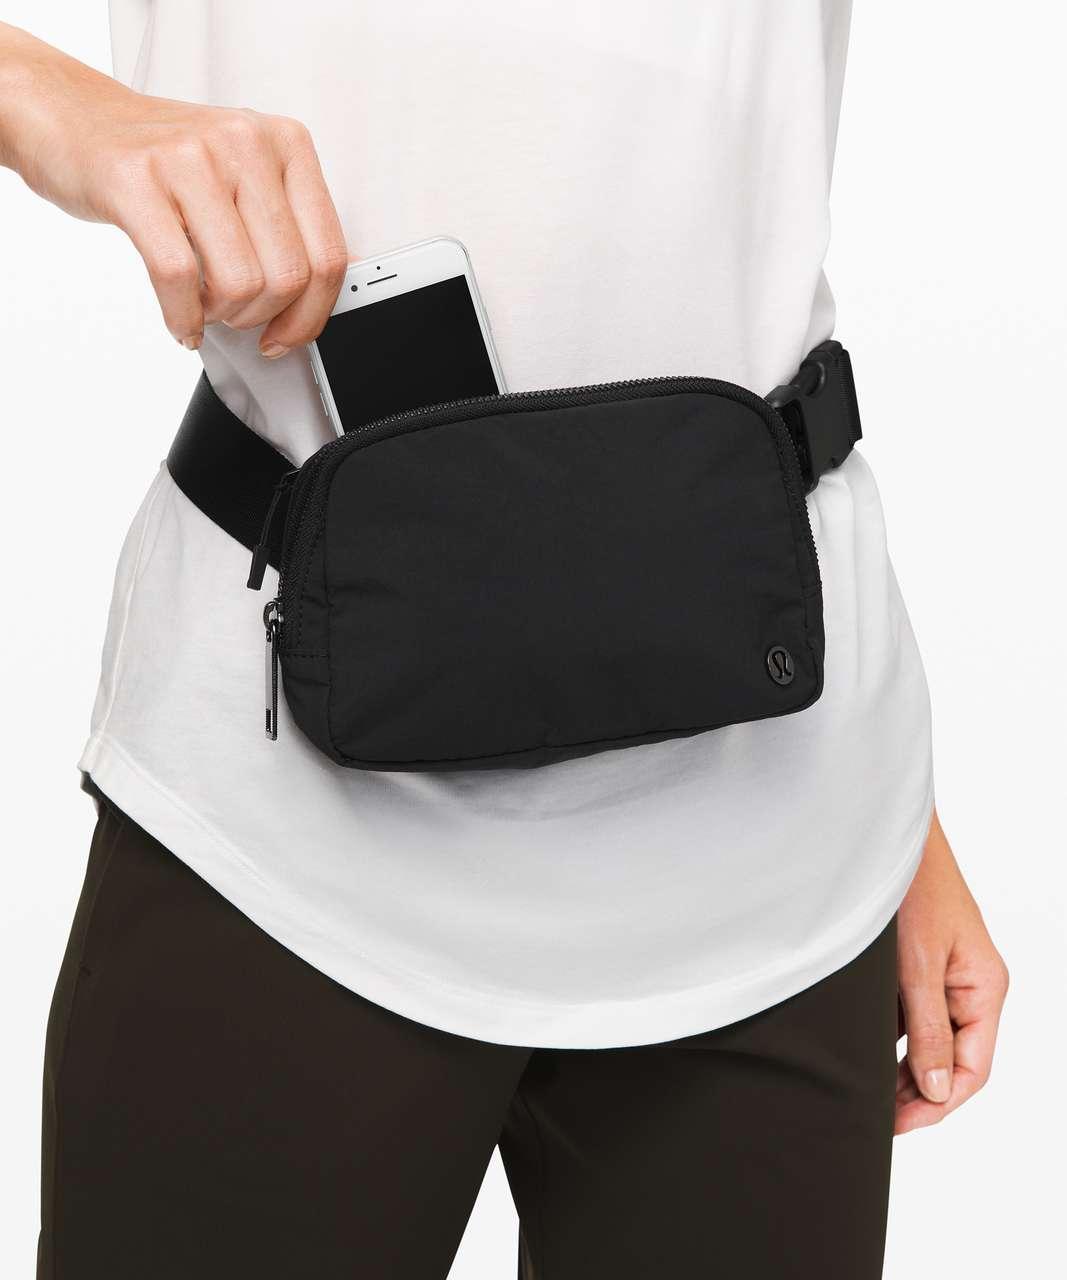 Lululemon Everywhere Belt Bag *Crinkle Nylon 1L - Black